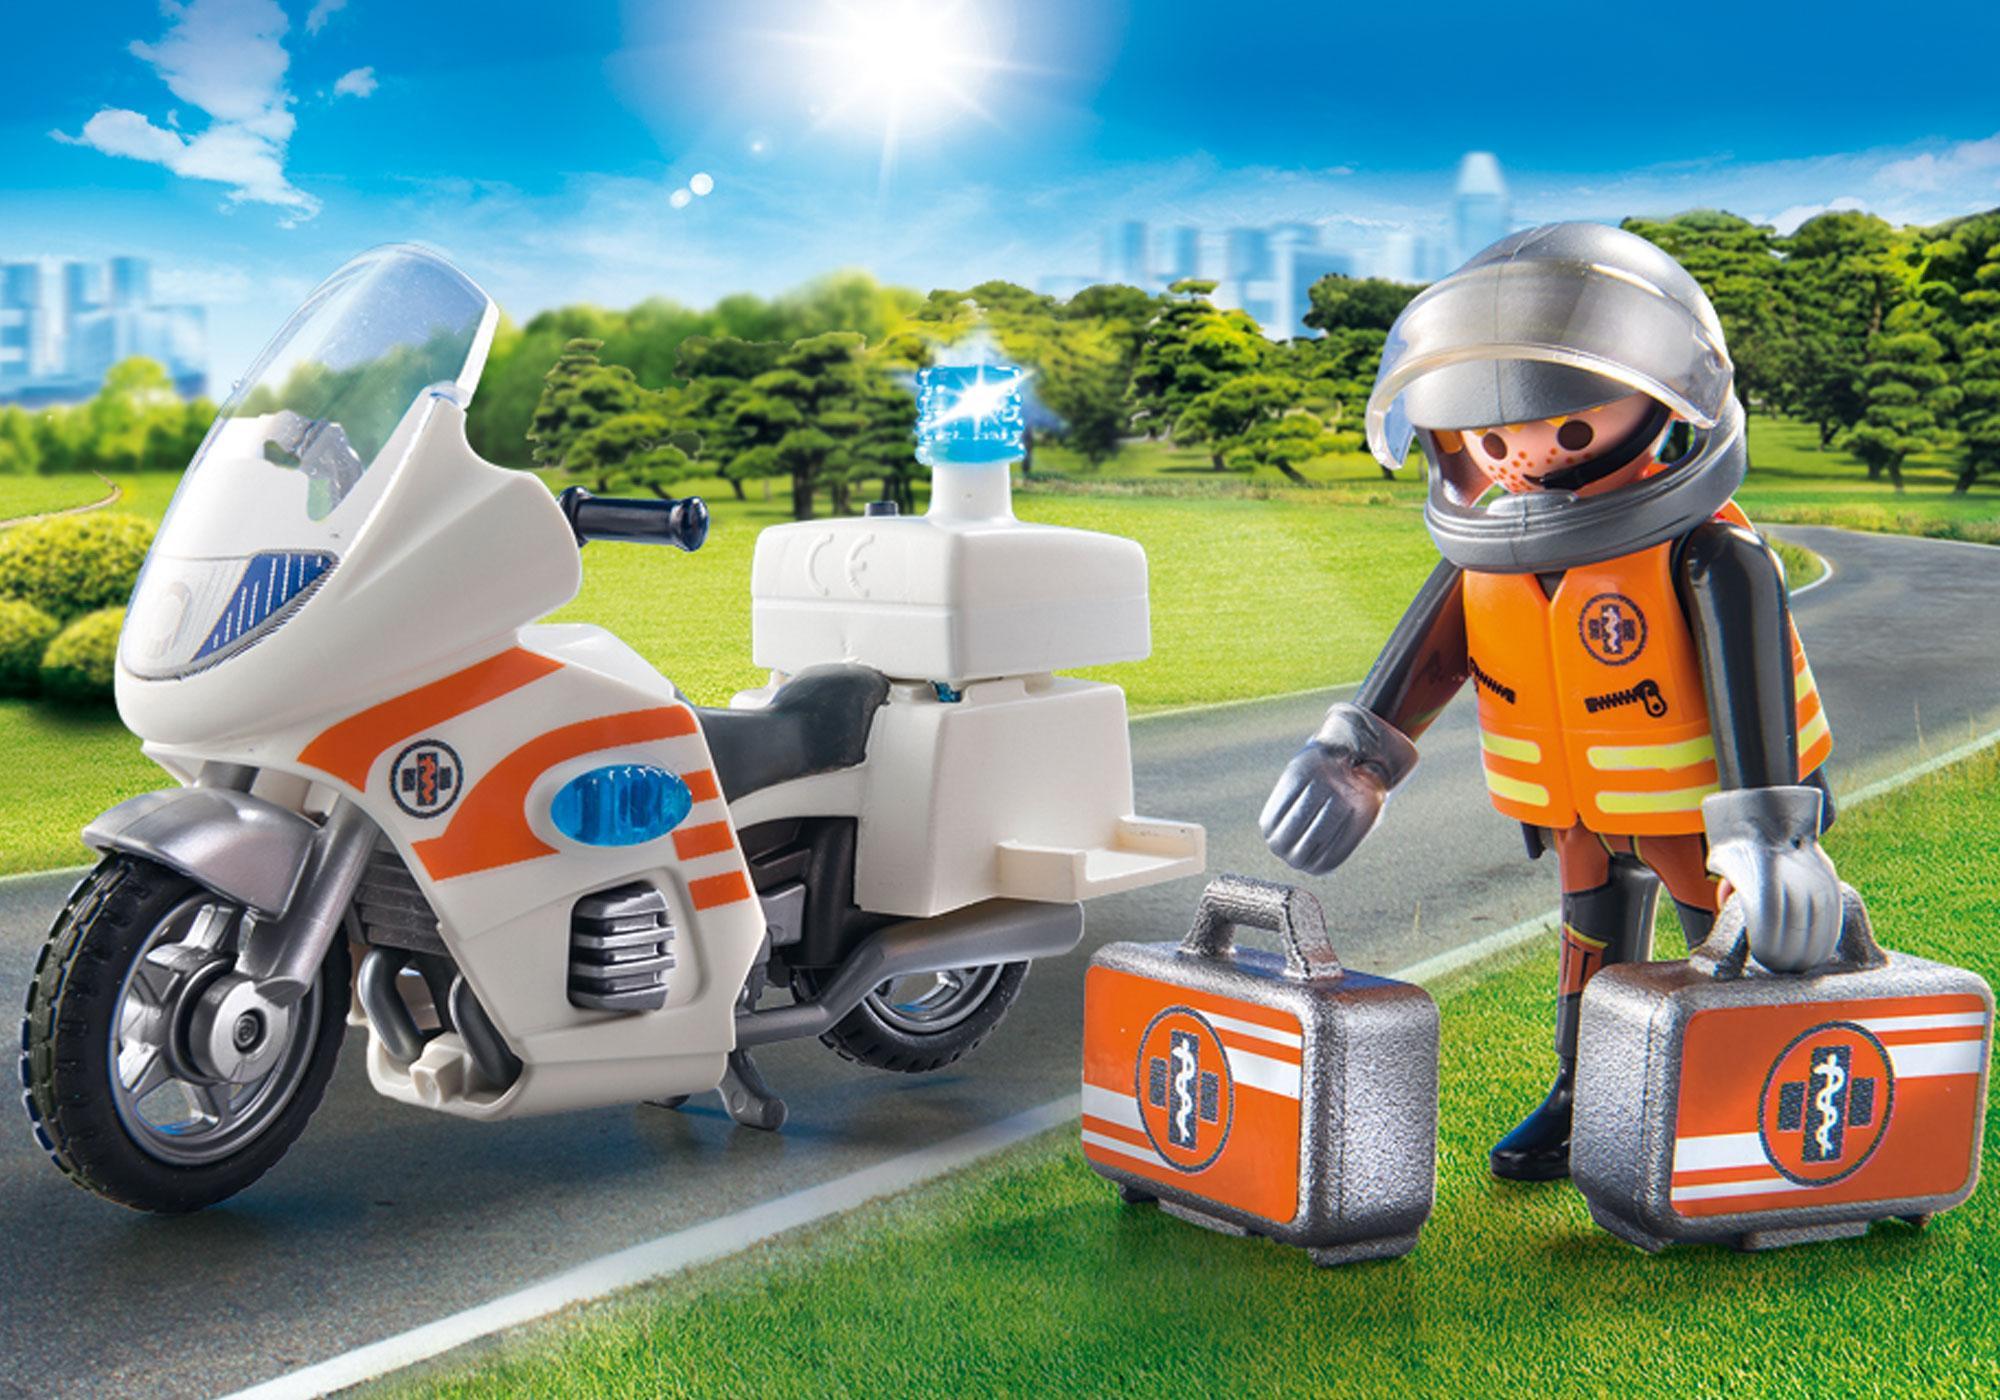 http://media.playmobil.com/i/playmobil/70051_product_extra1/Redningsmotorcykel